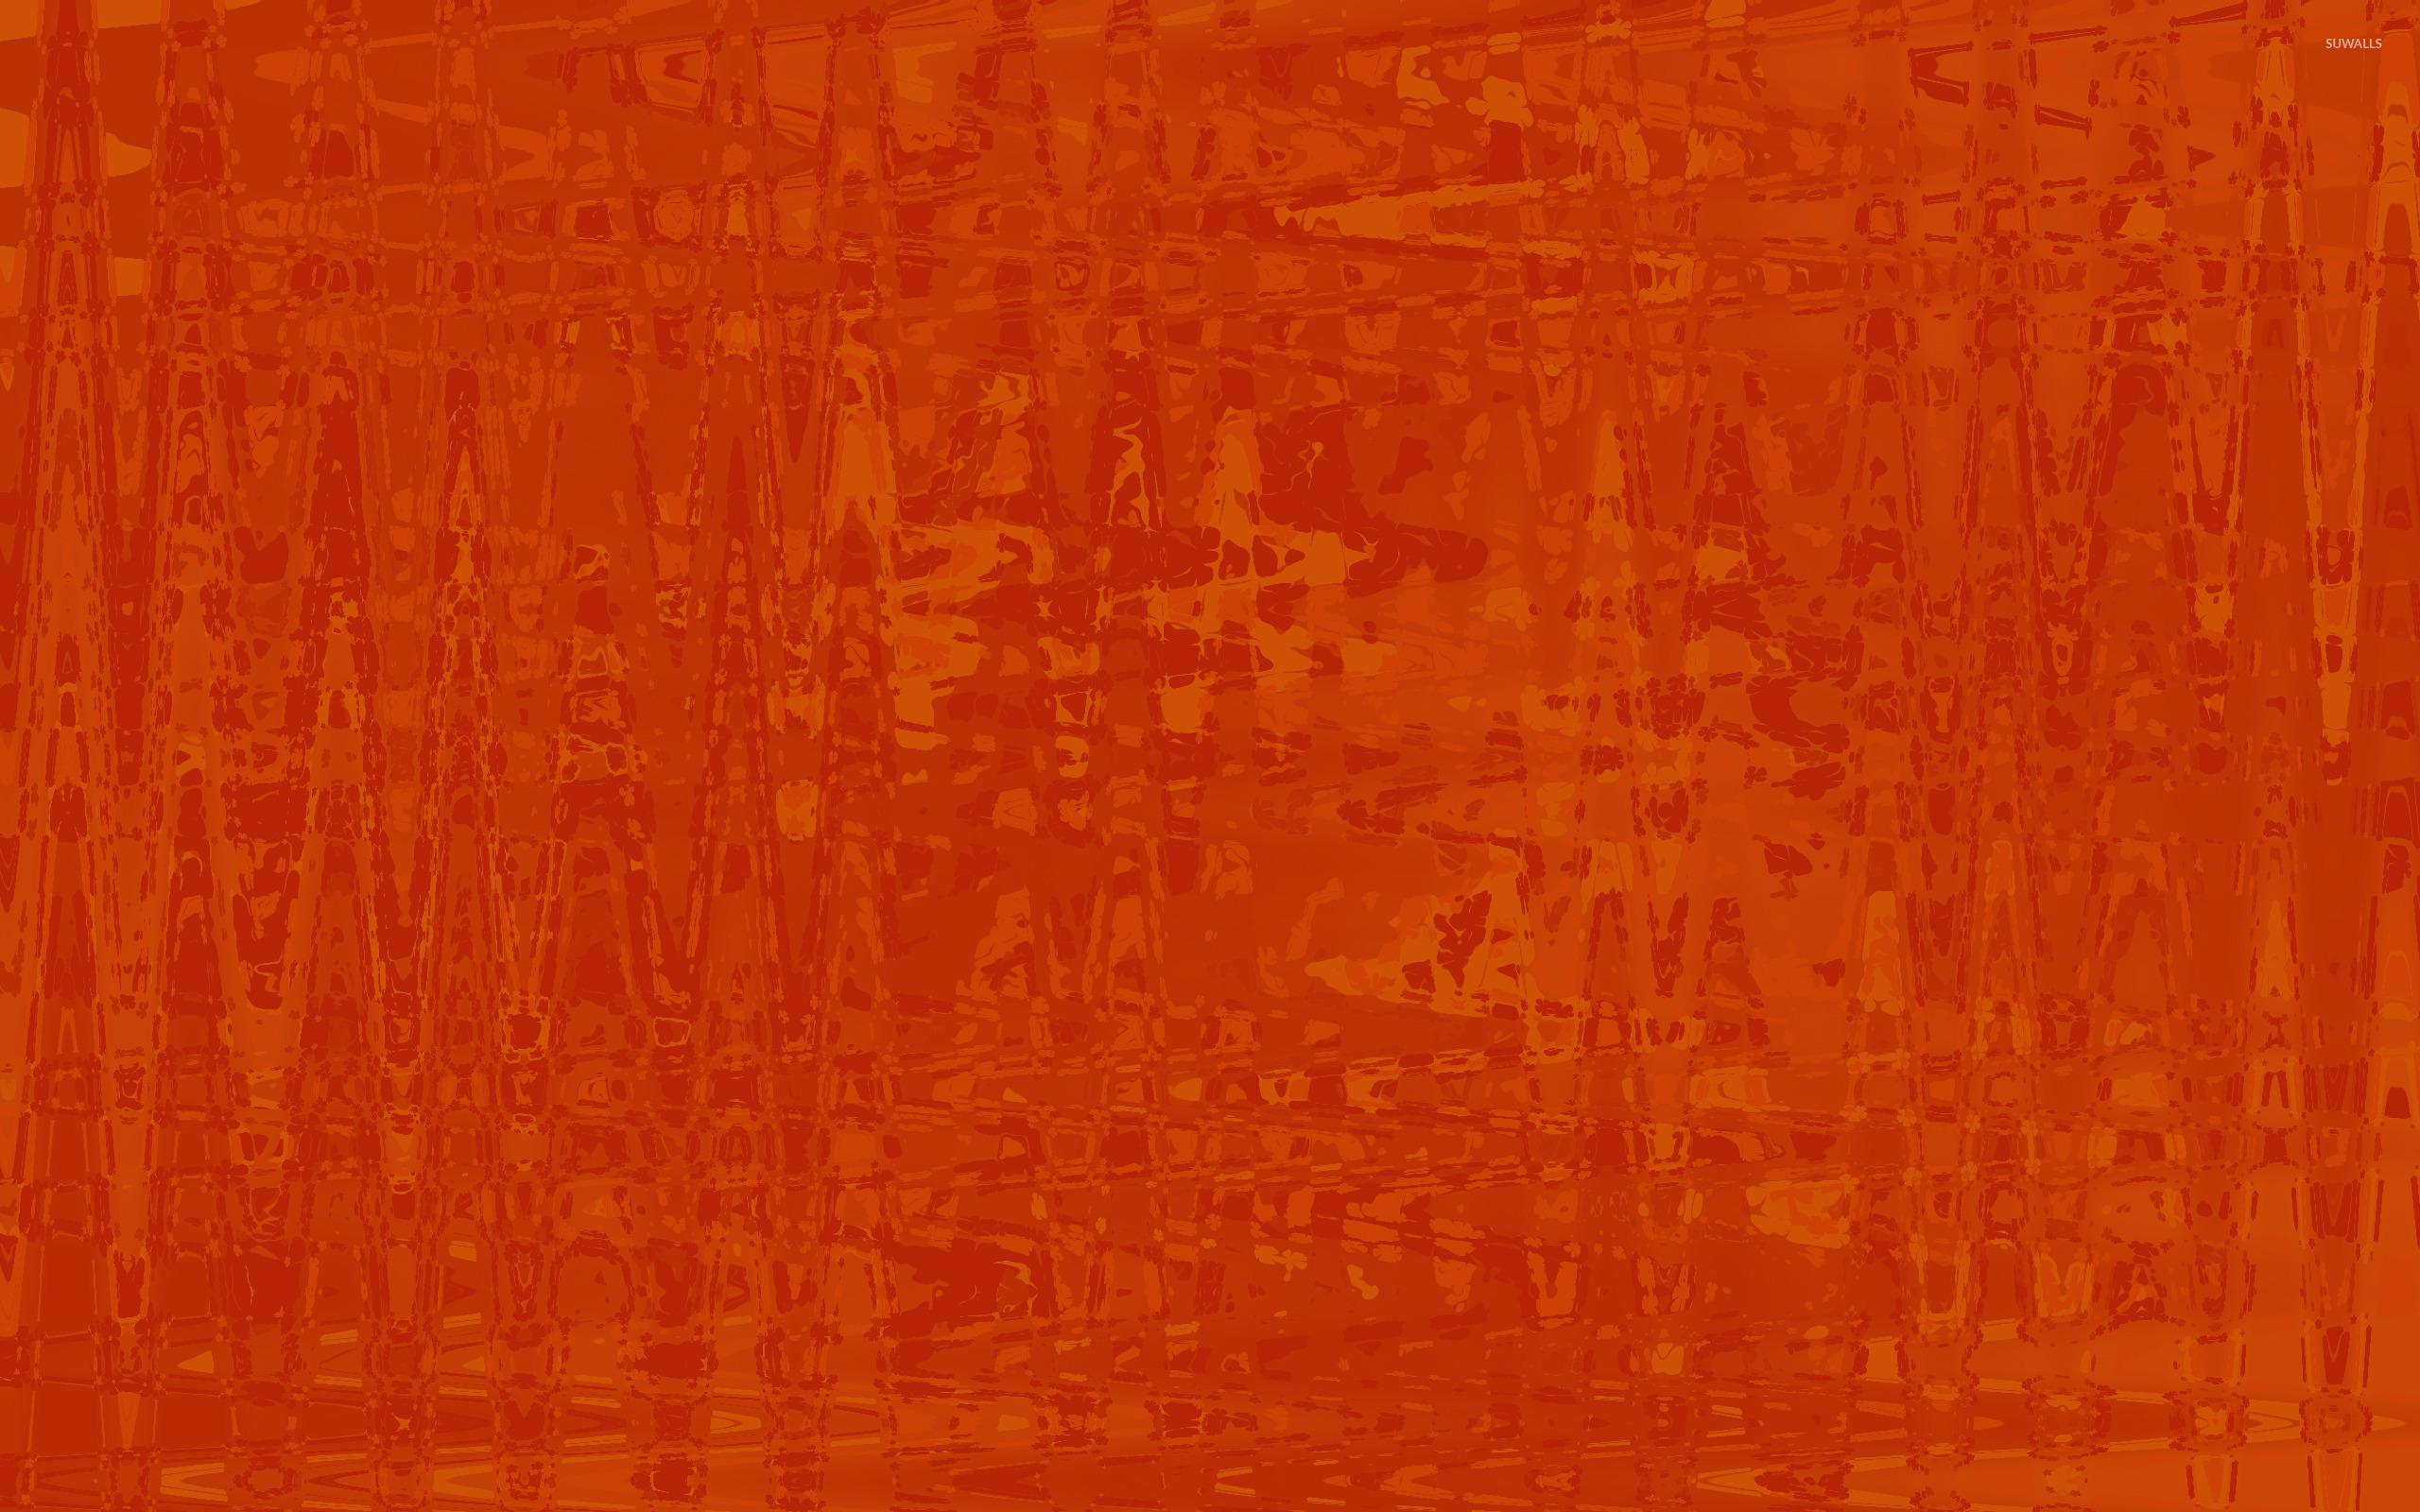 orange wave wallpaper - photo #23